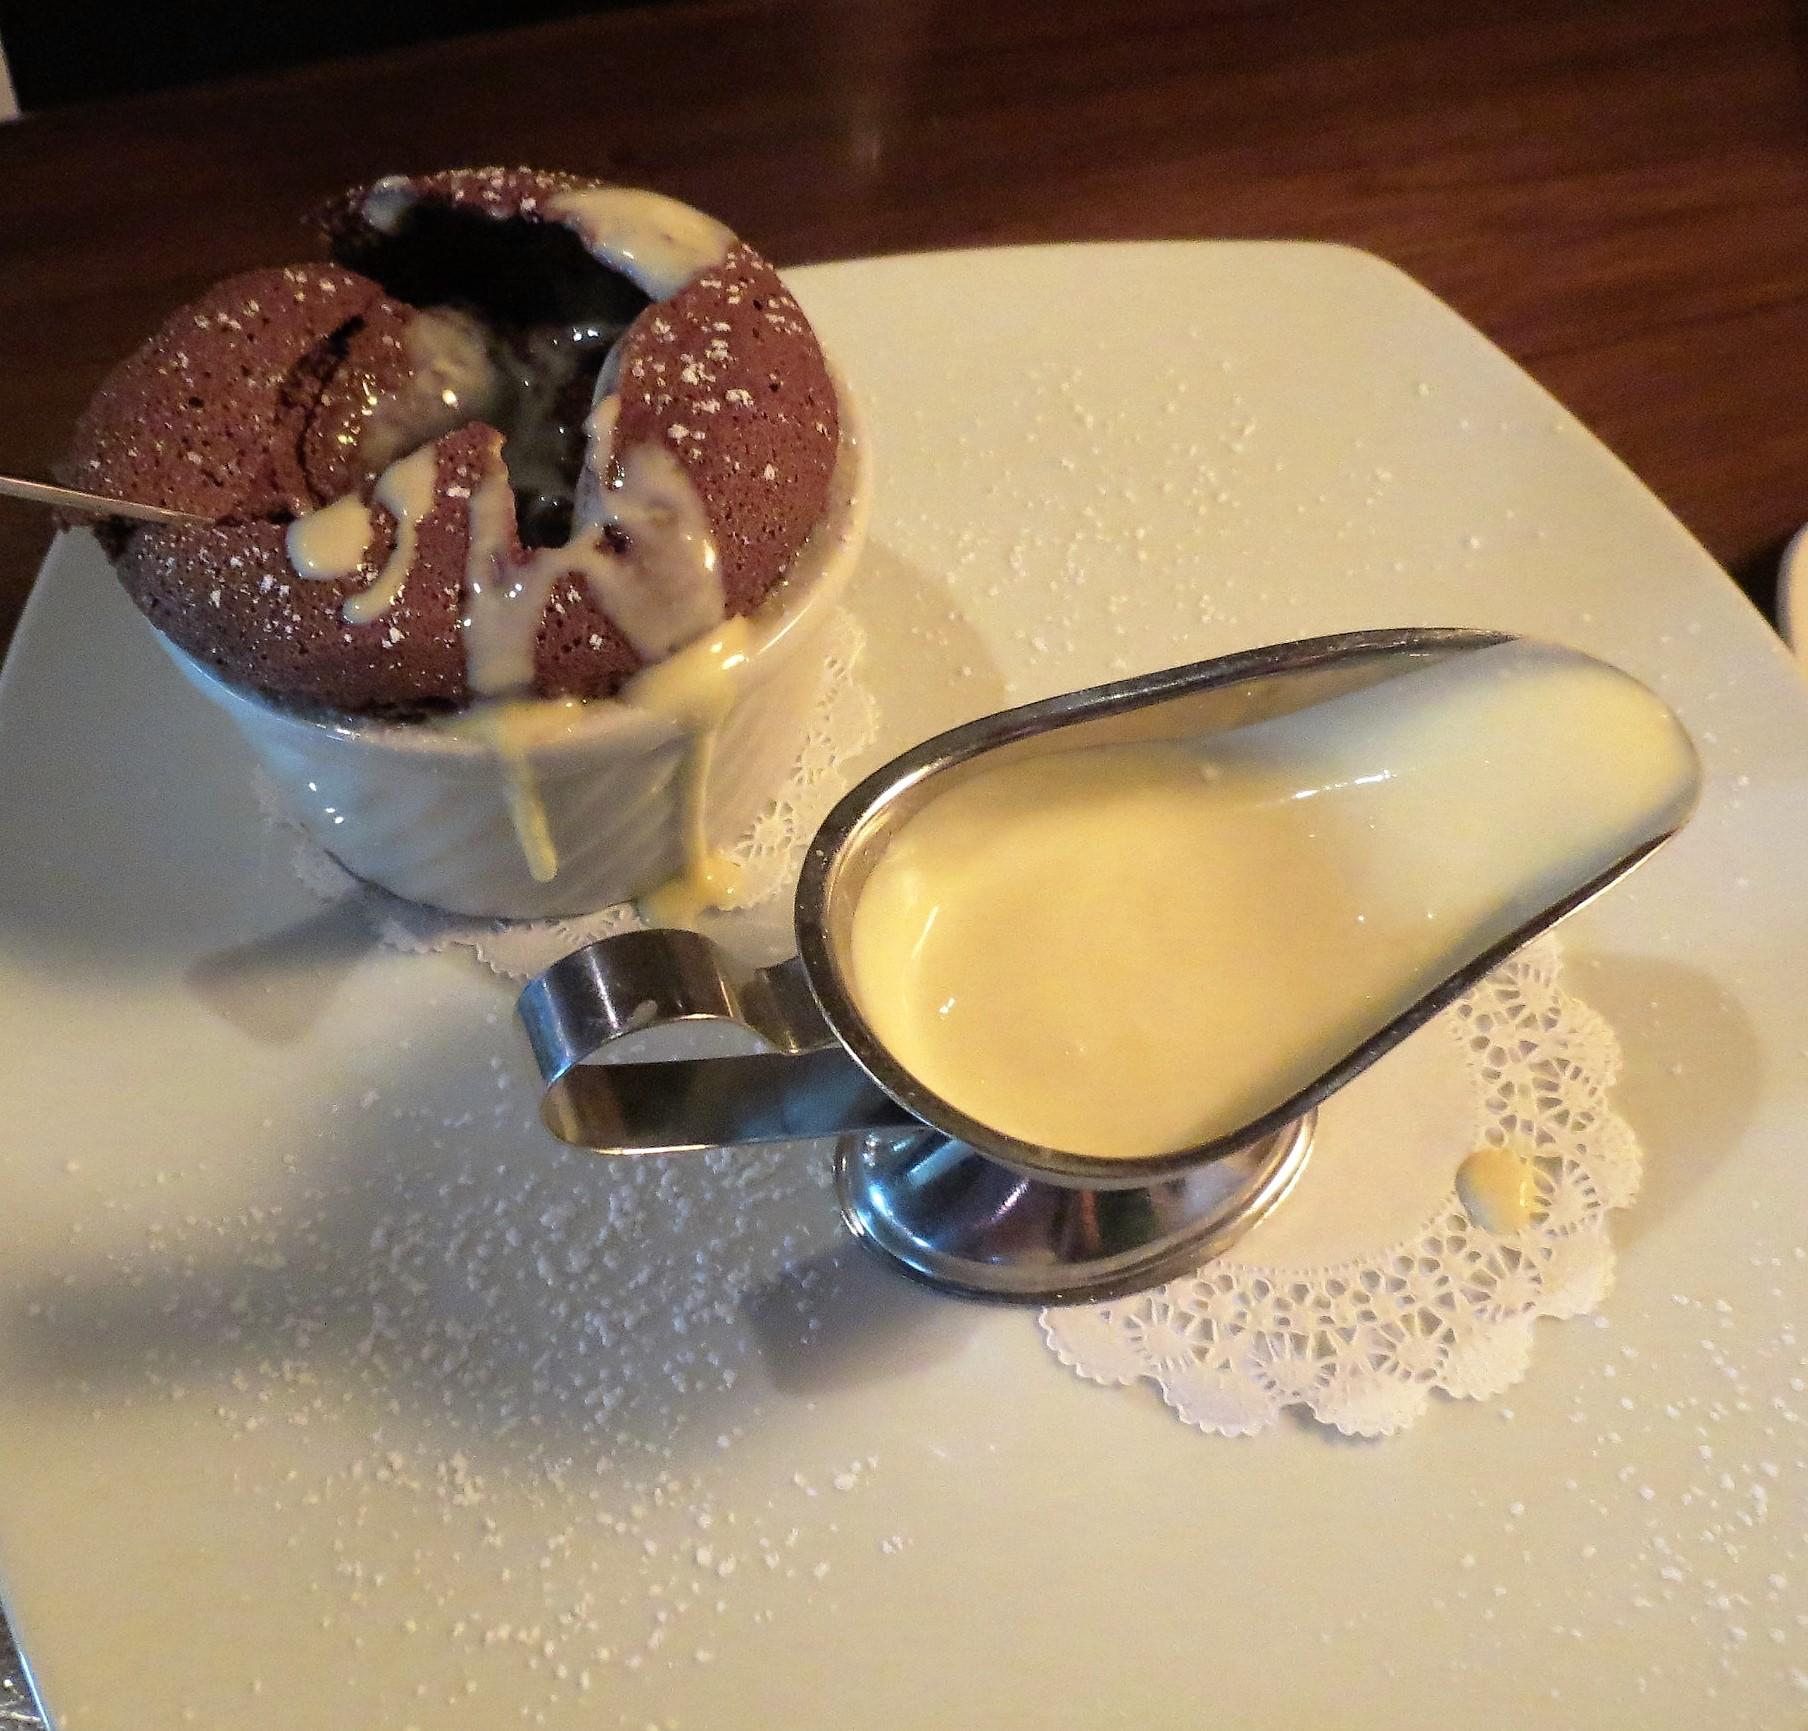 Grille 29 chocolate soufflé